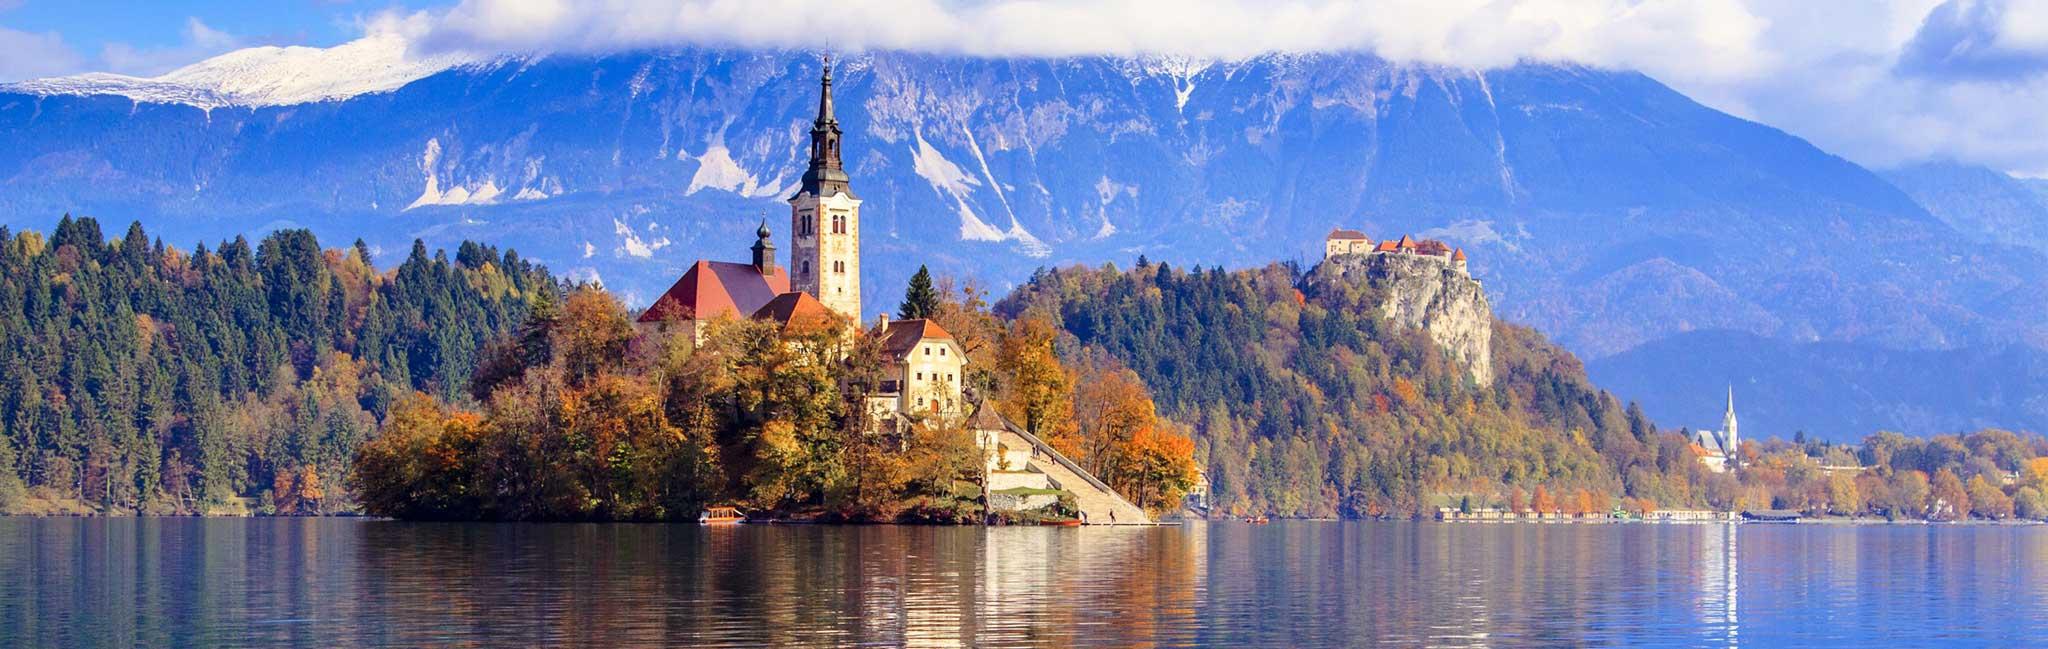 Slovenia Tours - Island Landscape